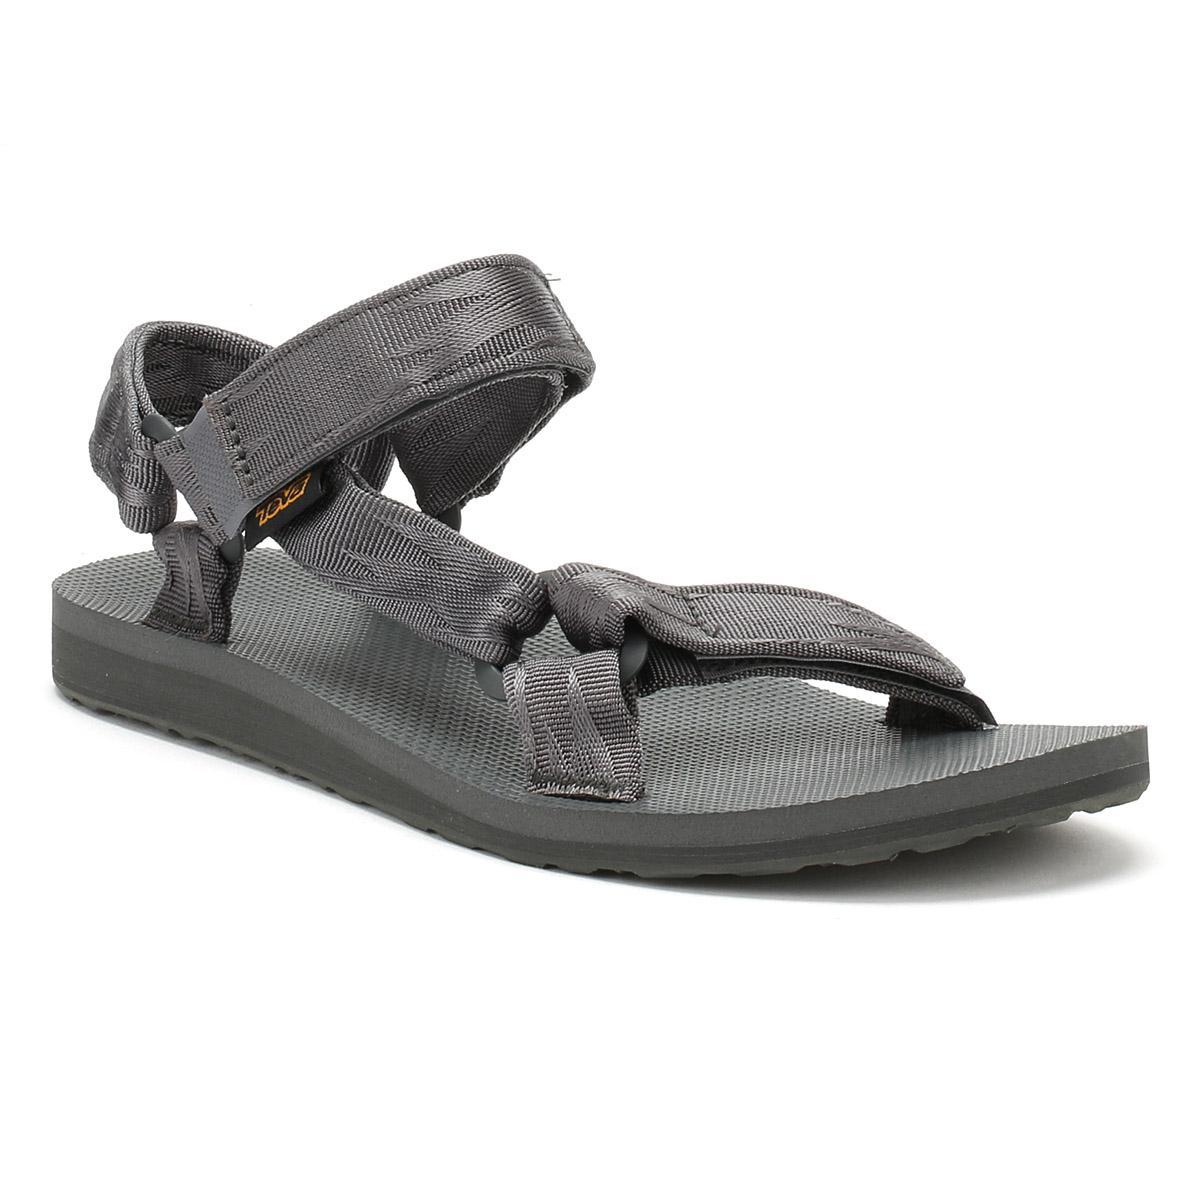 e07eb7ca473b04 Teva - Multicolor Mens Textured Dark Shadow Original Universal Sandals for  Men - Lyst